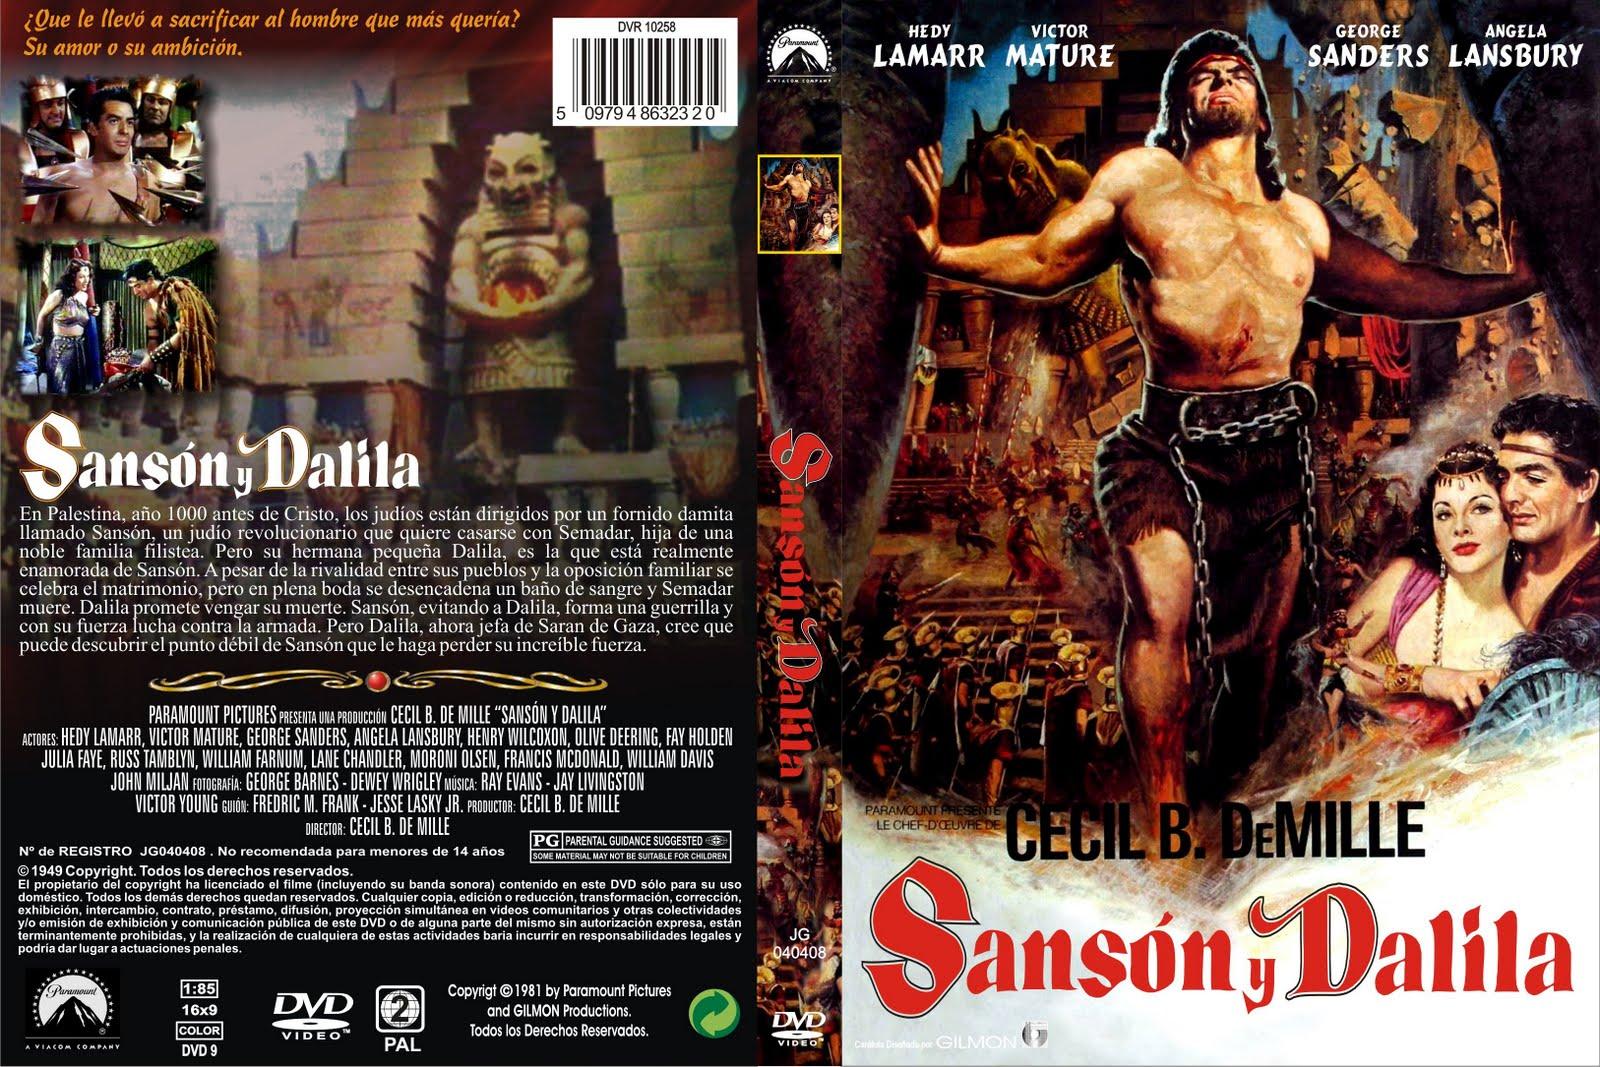 Samson and Delilah 1949 DVD Covers Com